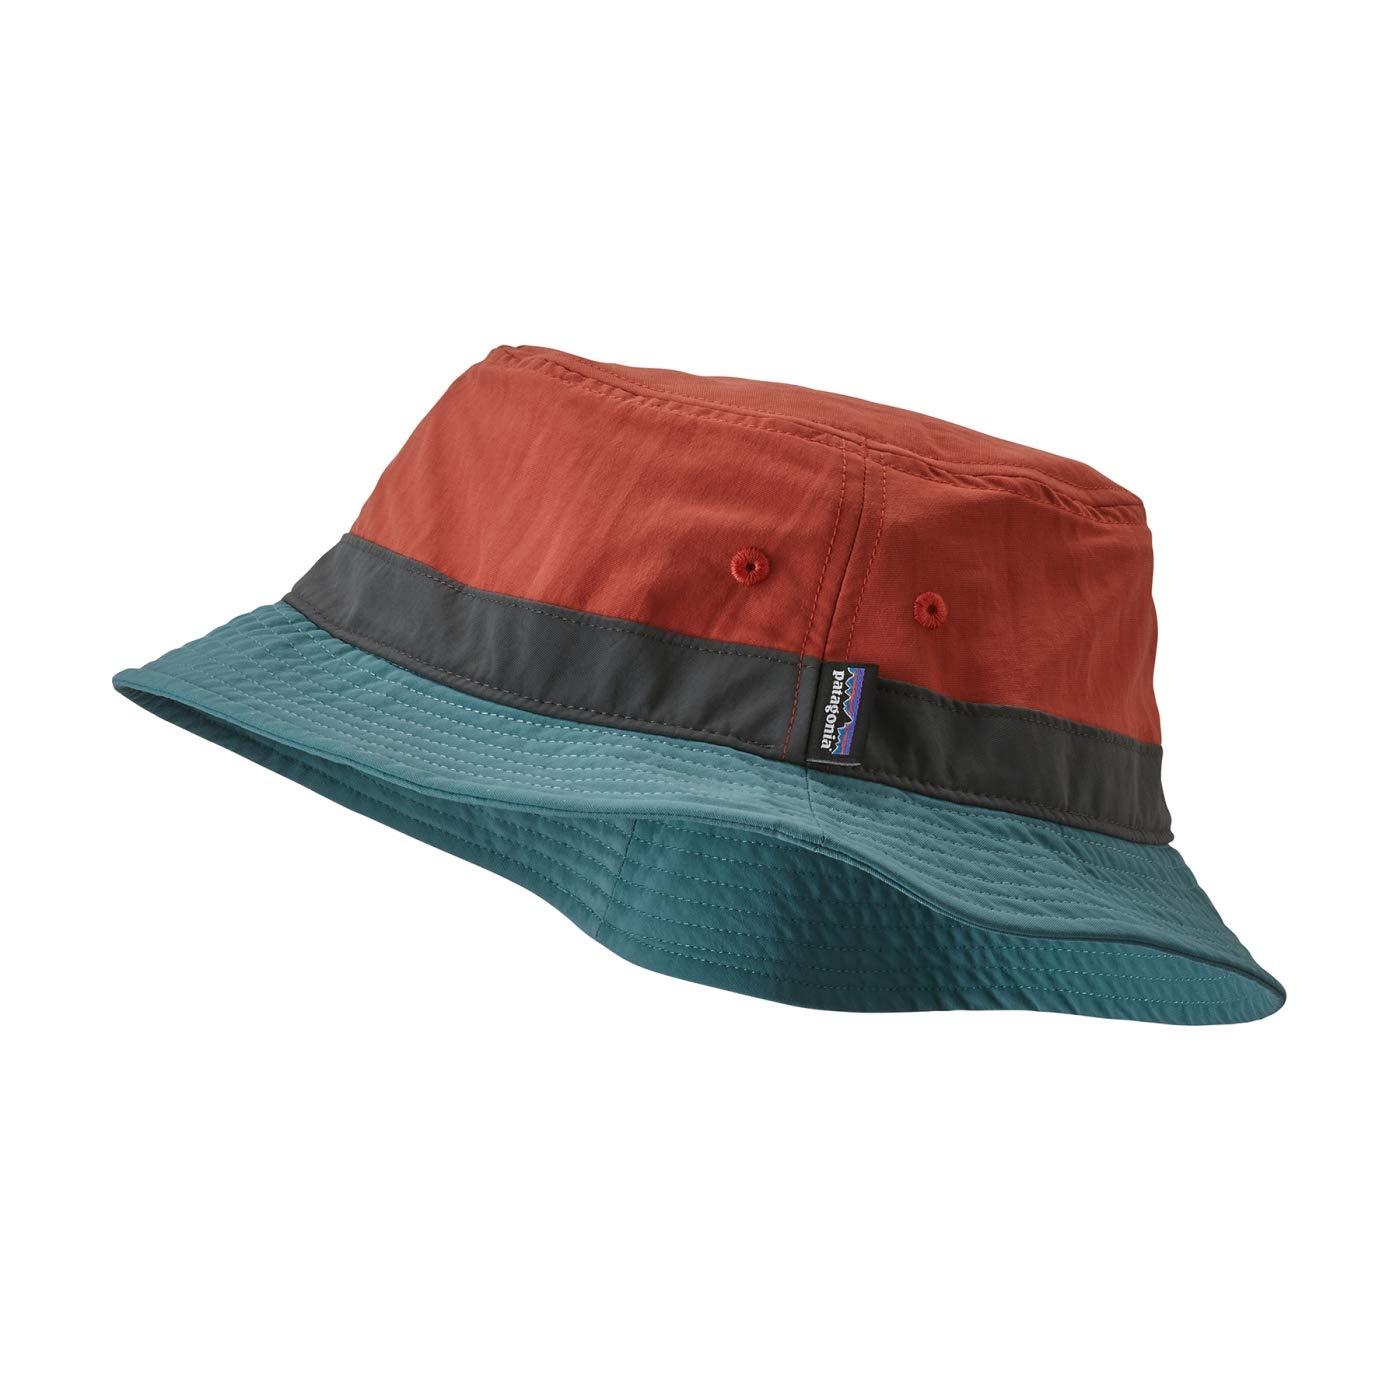 Patagonia - Bucket Hat - Wavefarer - New Adobe/Multicolor